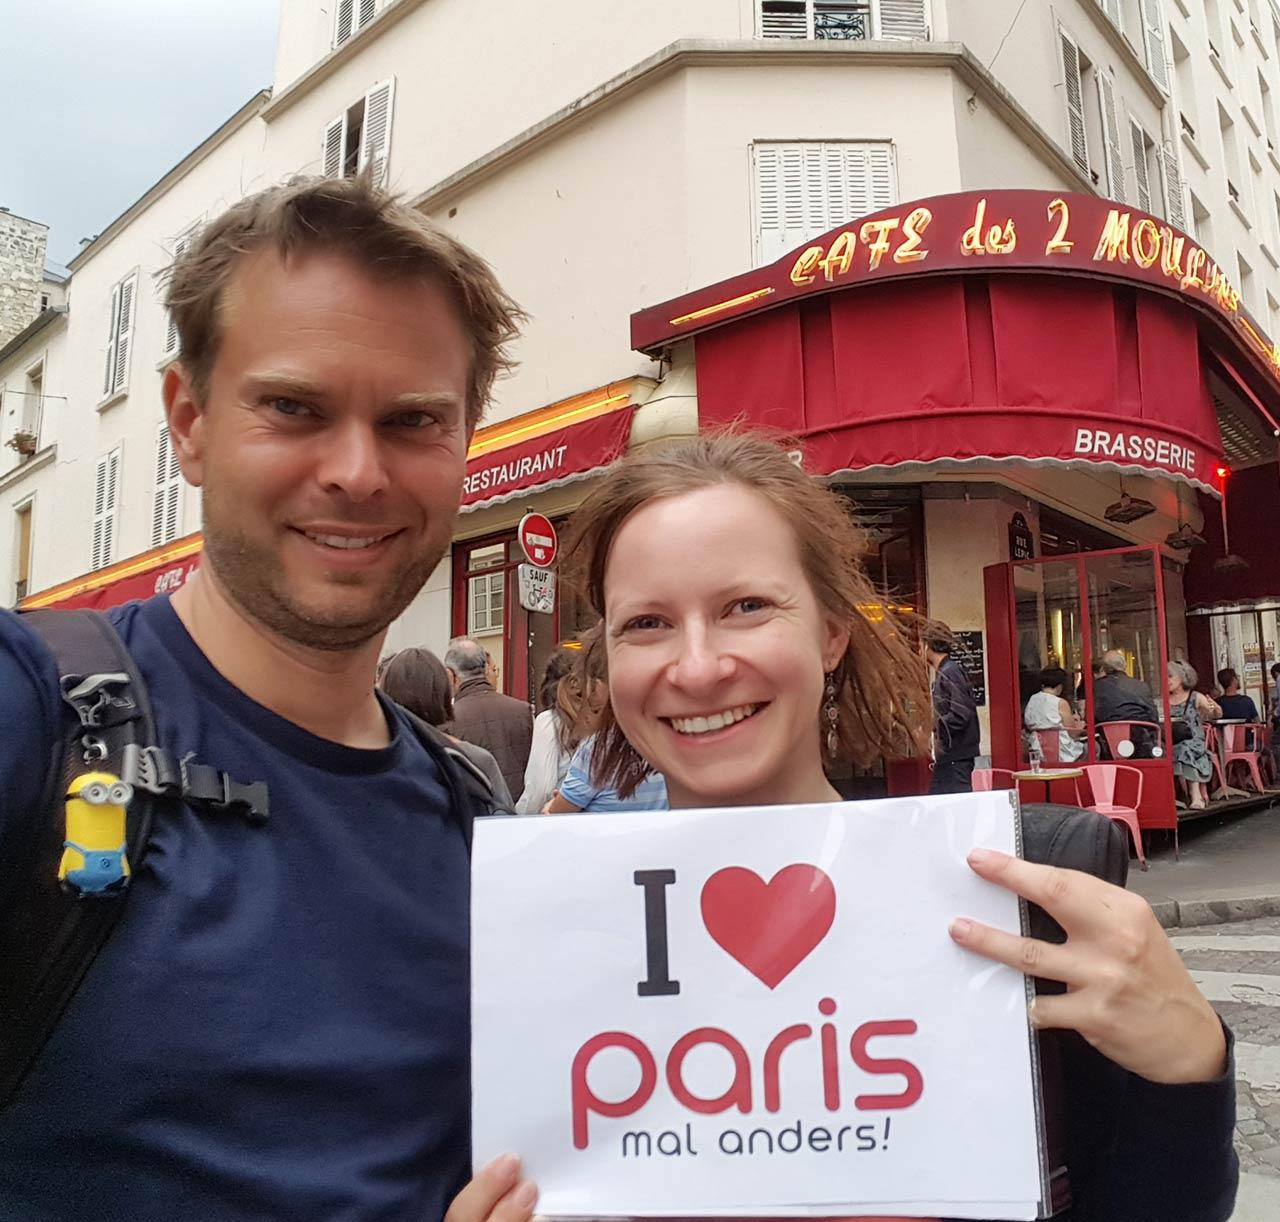 Erinnerungsfoto Paris mal anders Handy